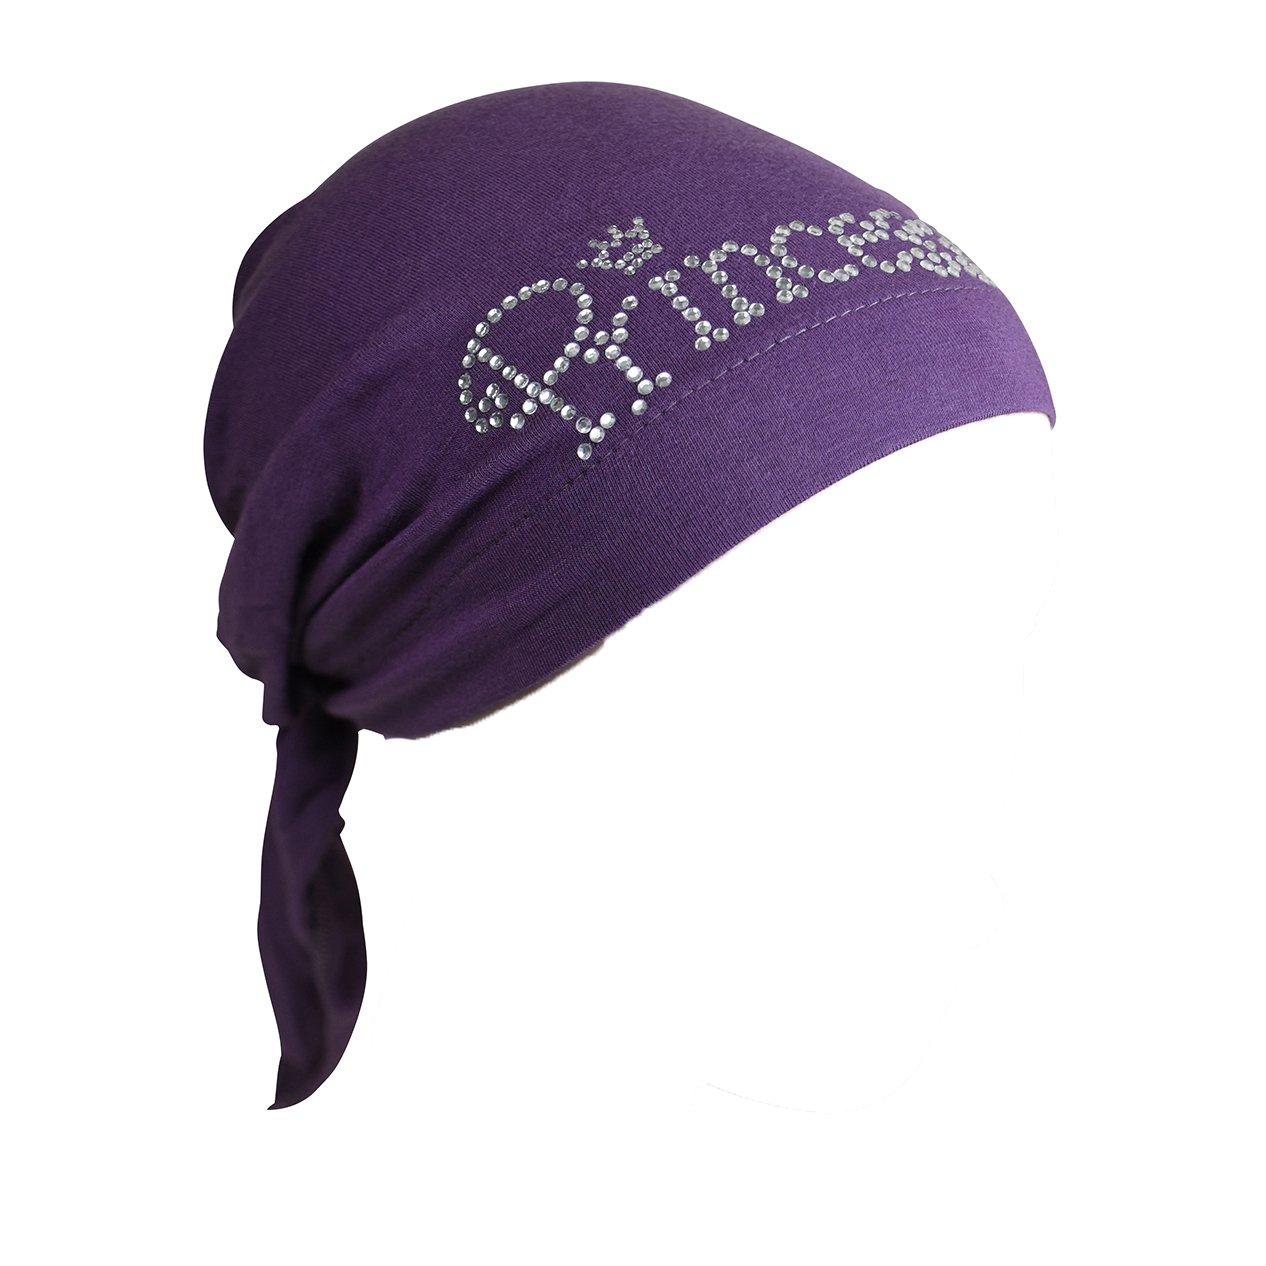 Princess Applique on Child's Pretied Head Scarf Cancer Cap Purple by Landana Headscarves (Image #1)